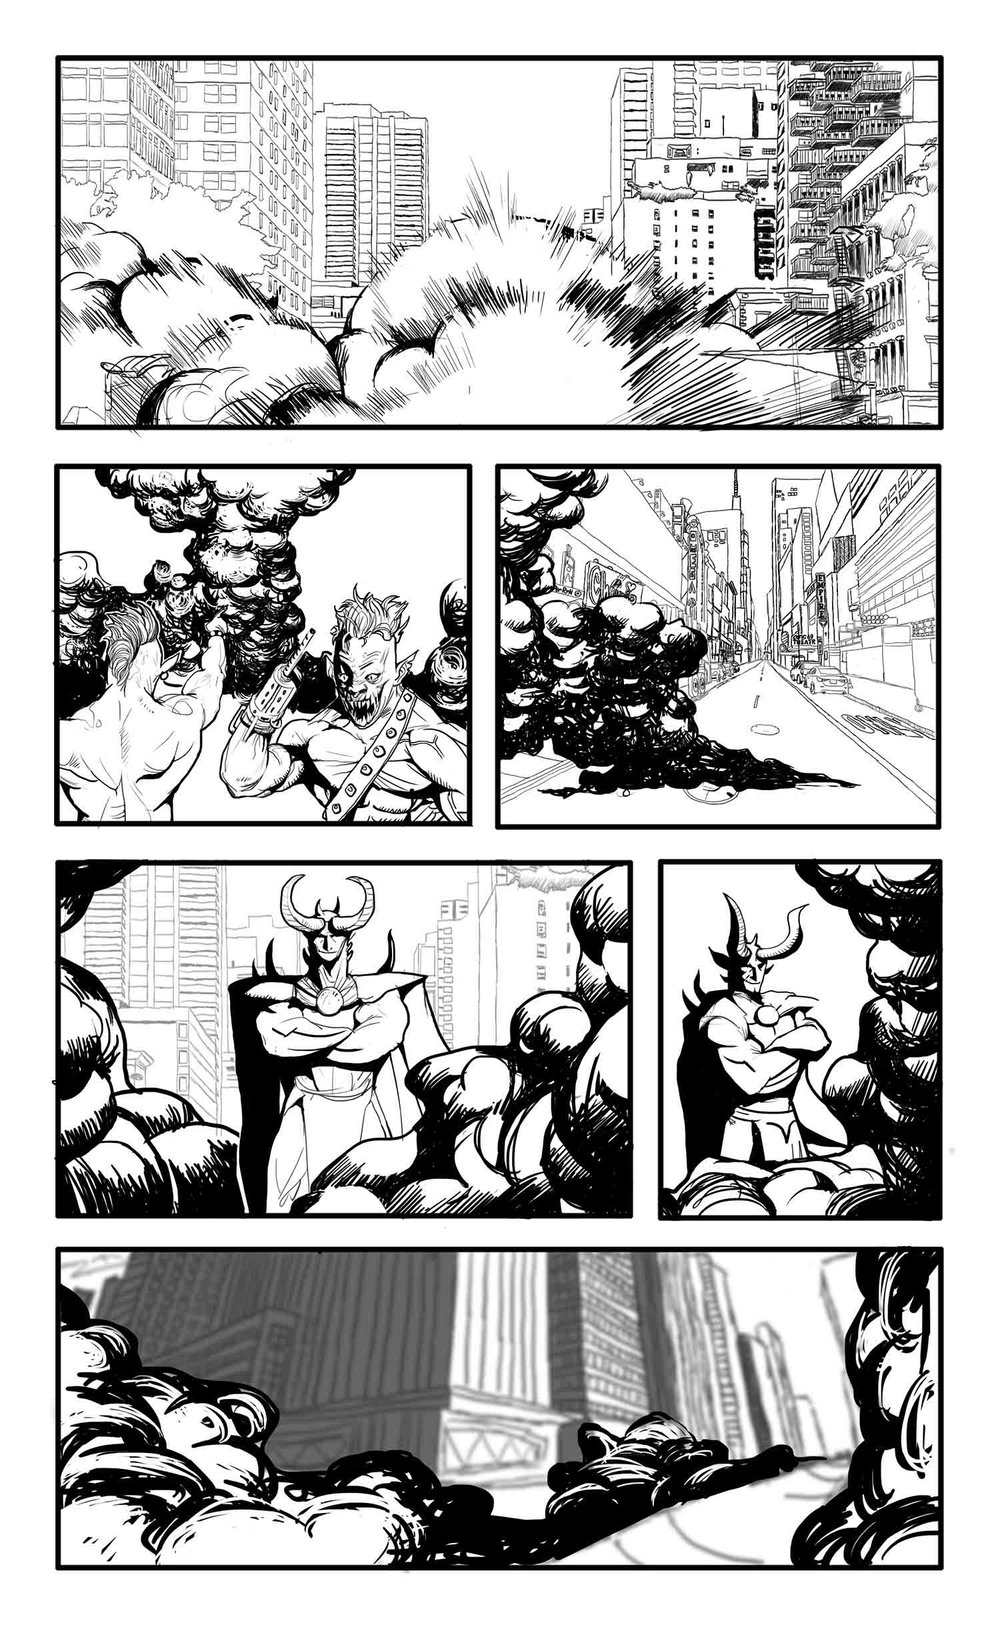 ashcan-digital-course-comic-portfolio-prep-works-11-v01-2018-08.jpg